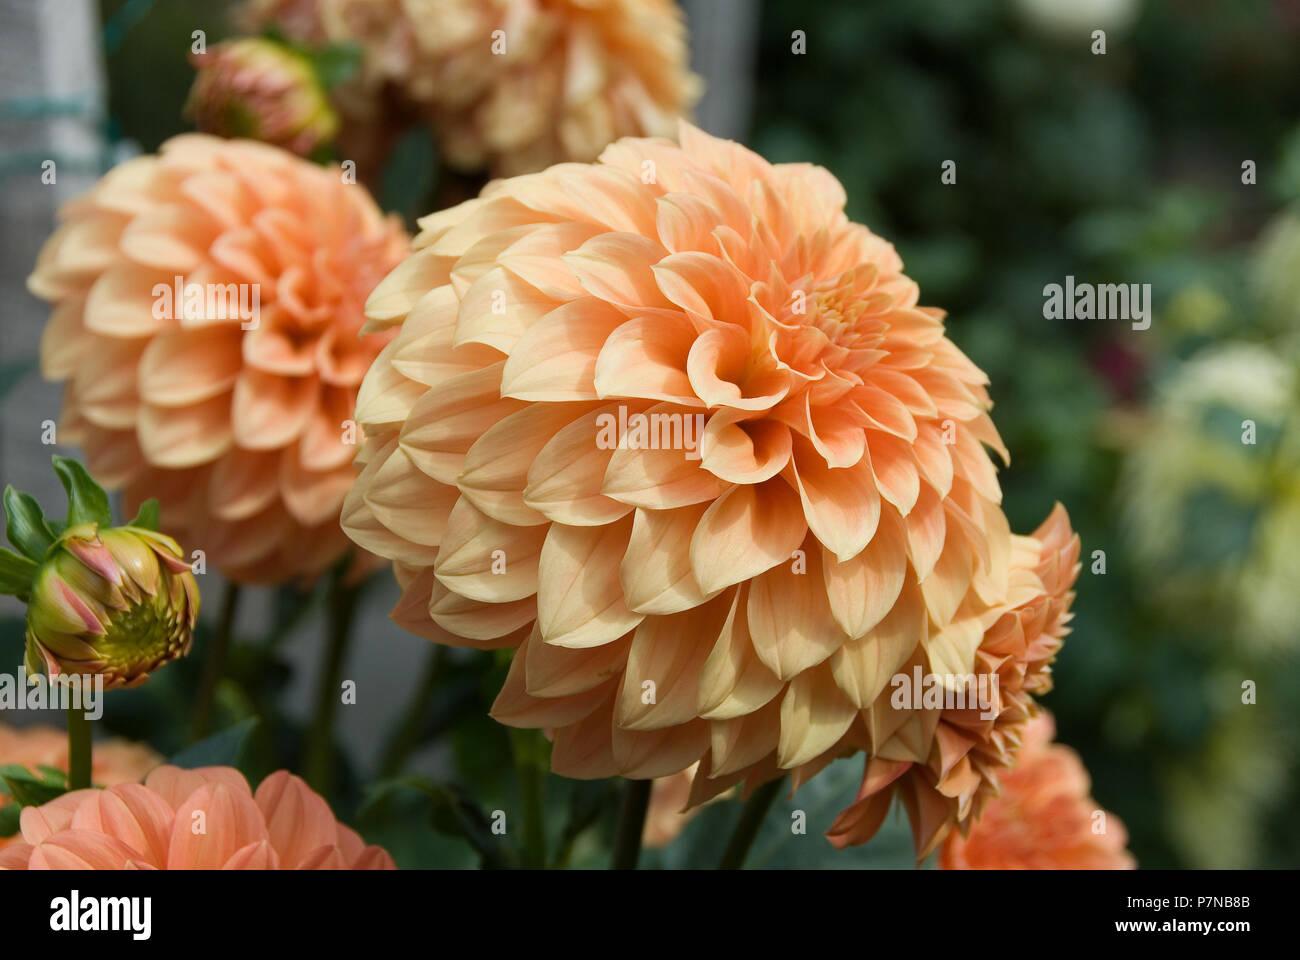 Orange Dahlia Flowers South Australia Stock Photo 211296859 Alamy